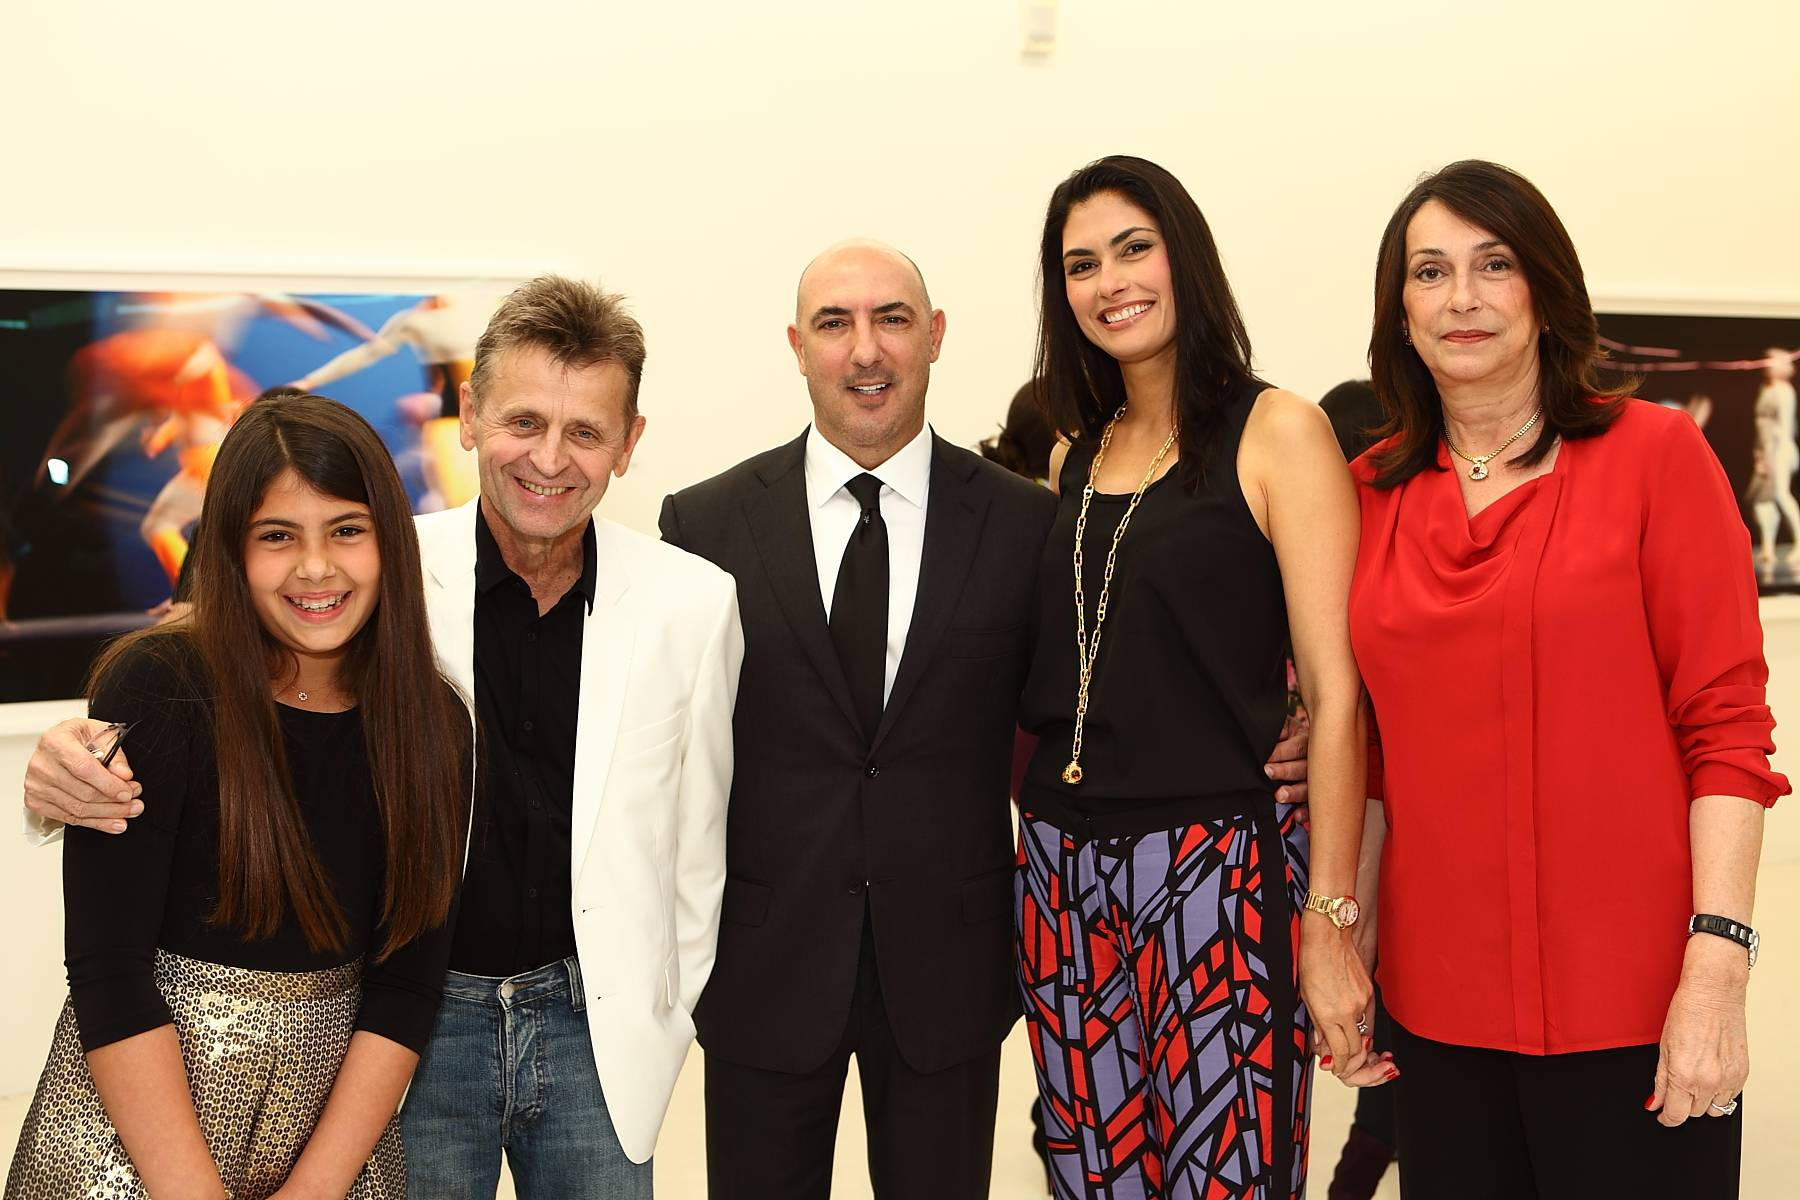 Mills Nader, Mikhail Baryshnikov, Gary Nader, Jennifer Nader, Dora Infante